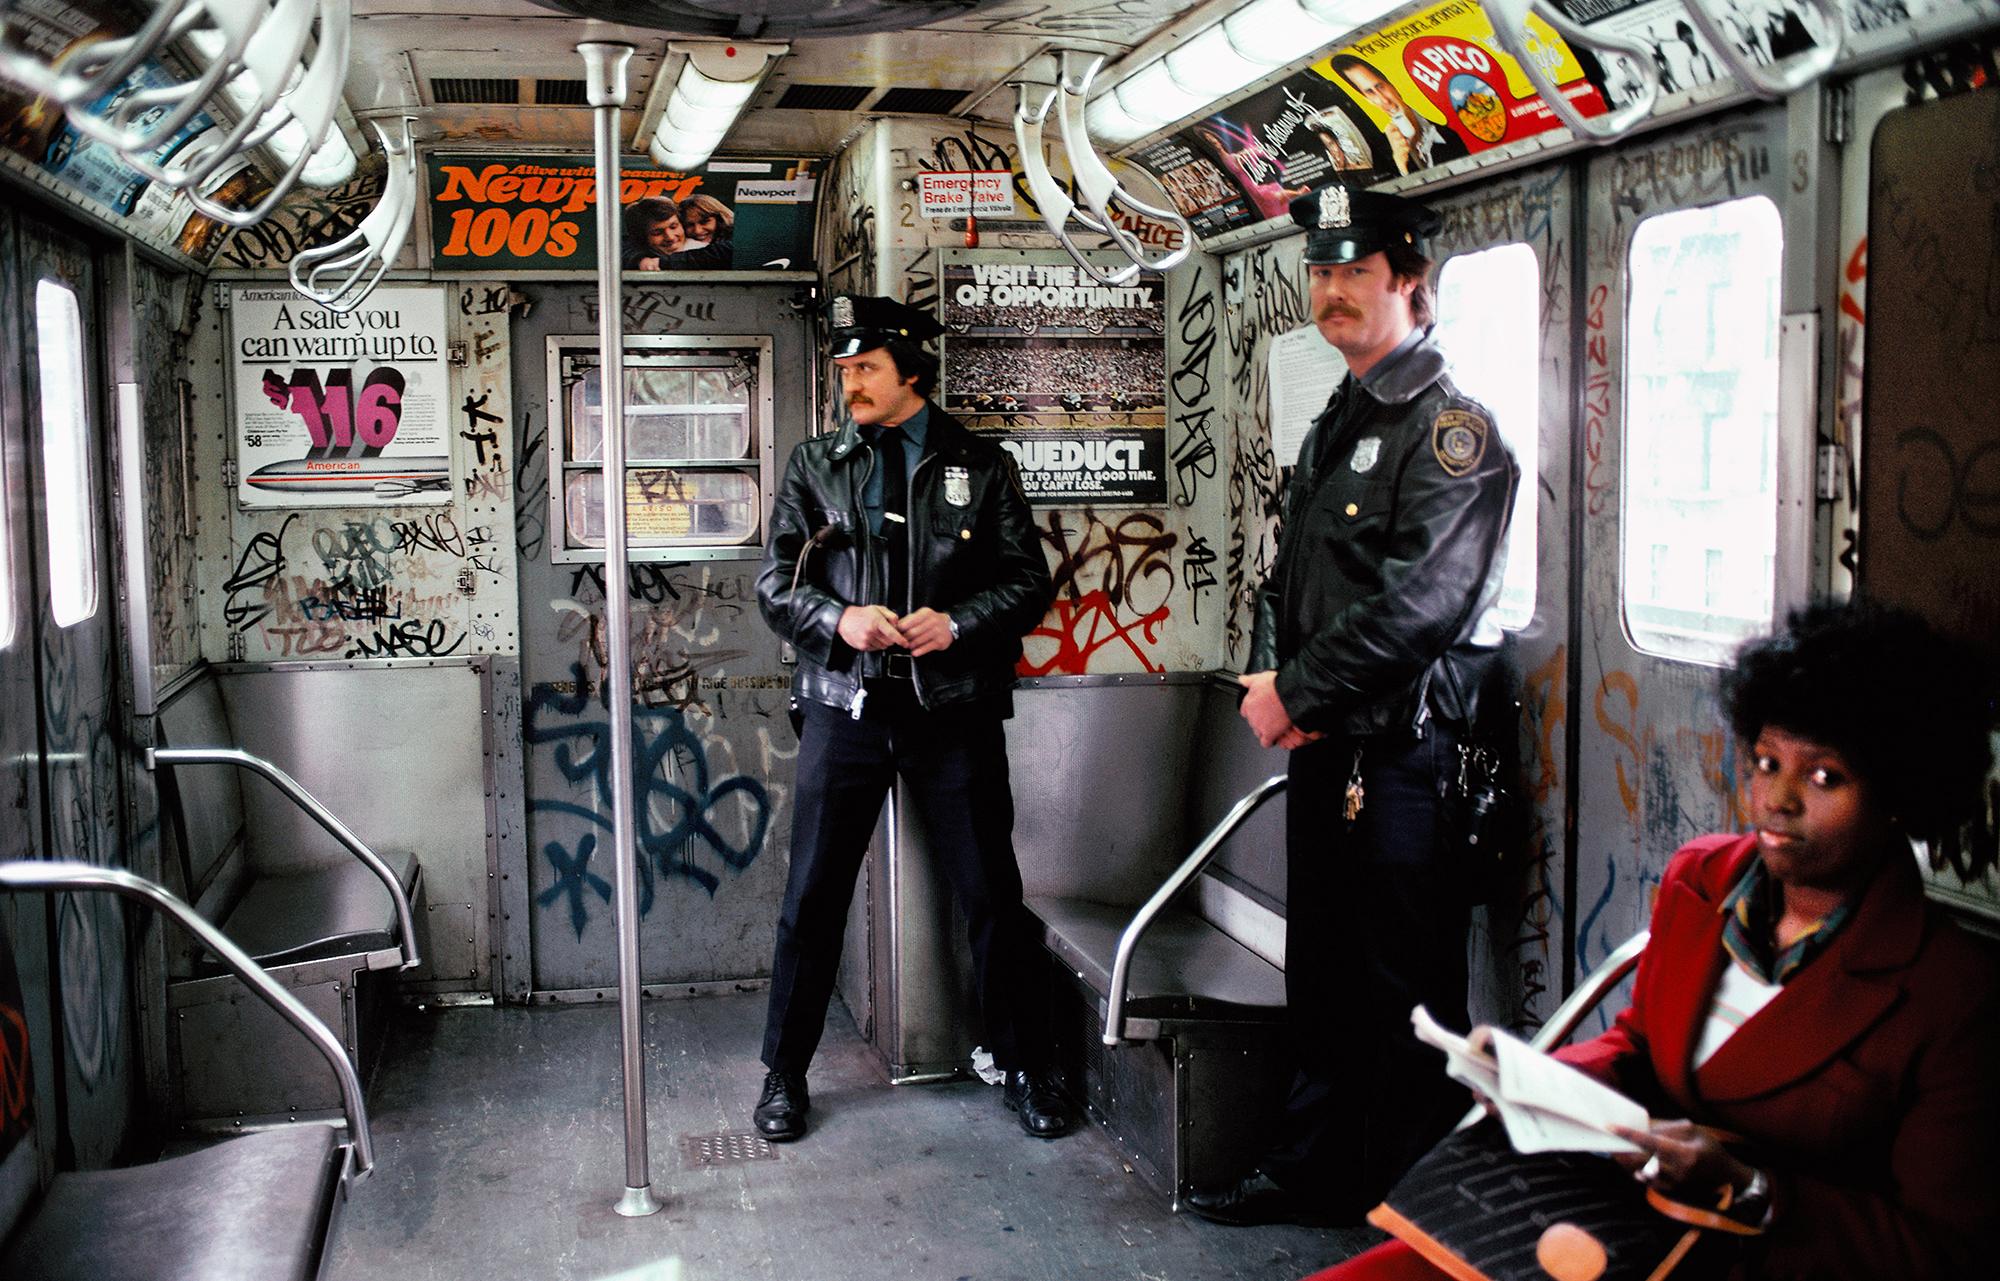 Two Cops Patrolling Subway, Bronx, NY, 1981